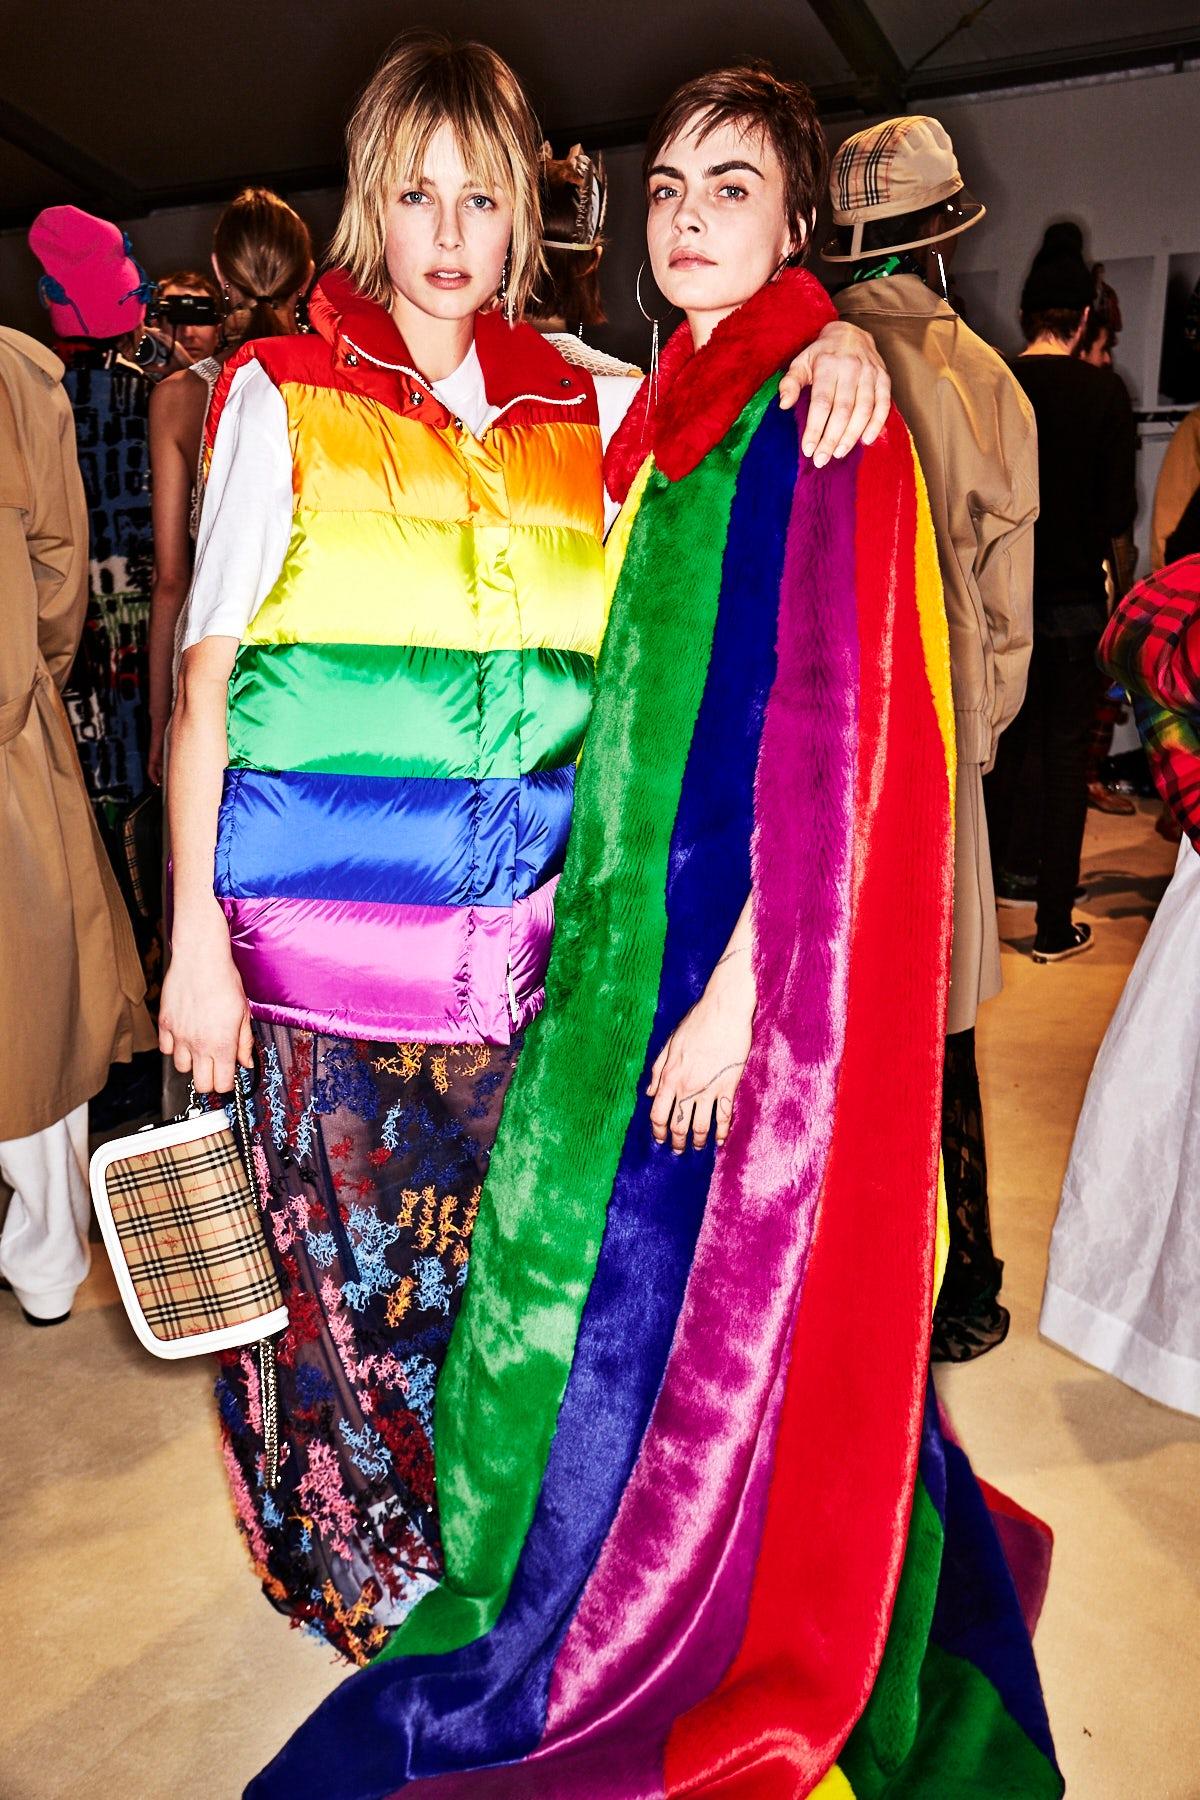 Burberry's LGBTQ+ Statement Was More Than Marketing